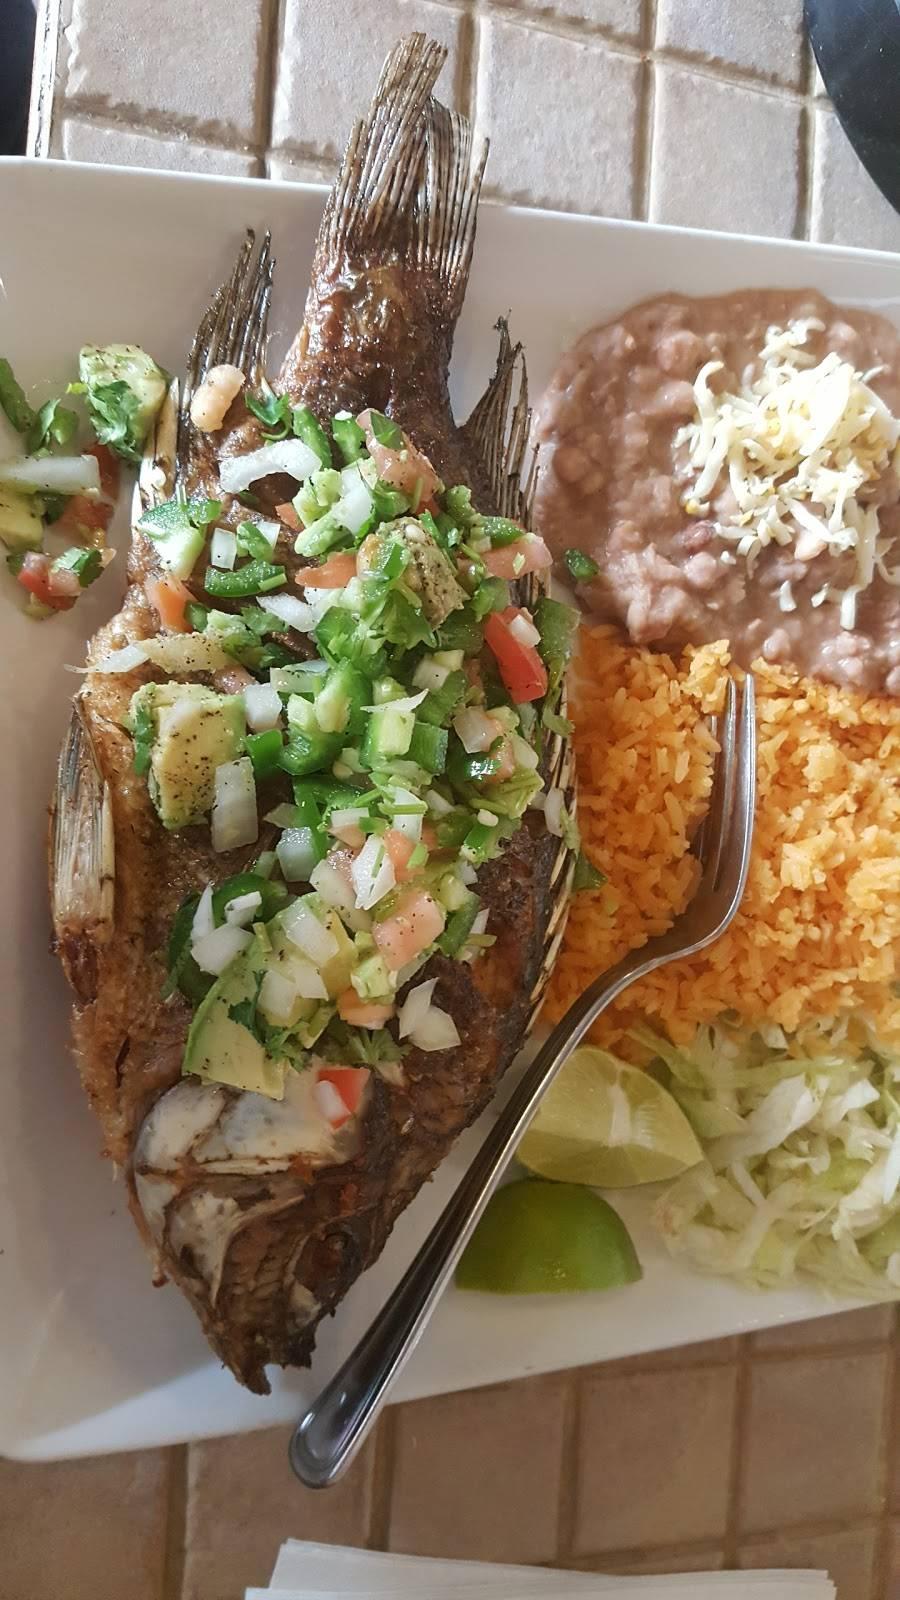 Mr Salsa   restaurant   1025 W Montrose Ave, Chicago, IL 60613, USA   7738800355 OR +1 773-880-0355